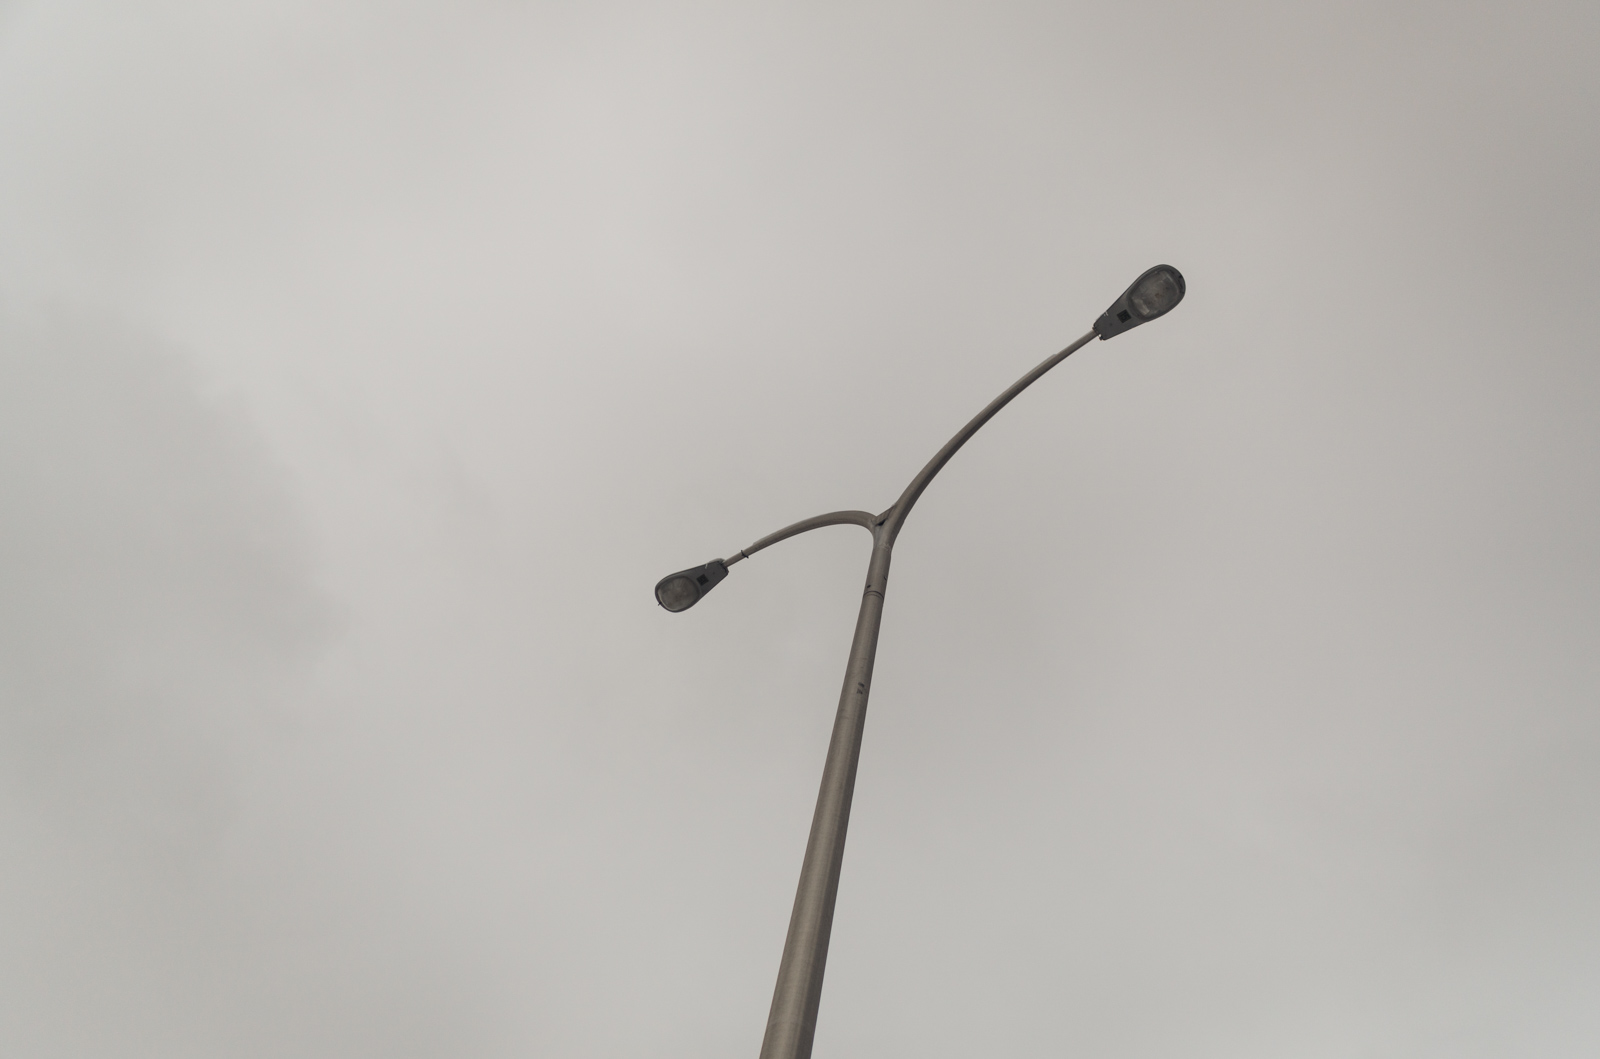 lakeheadwalk-sony-012319-blog-45.jpg